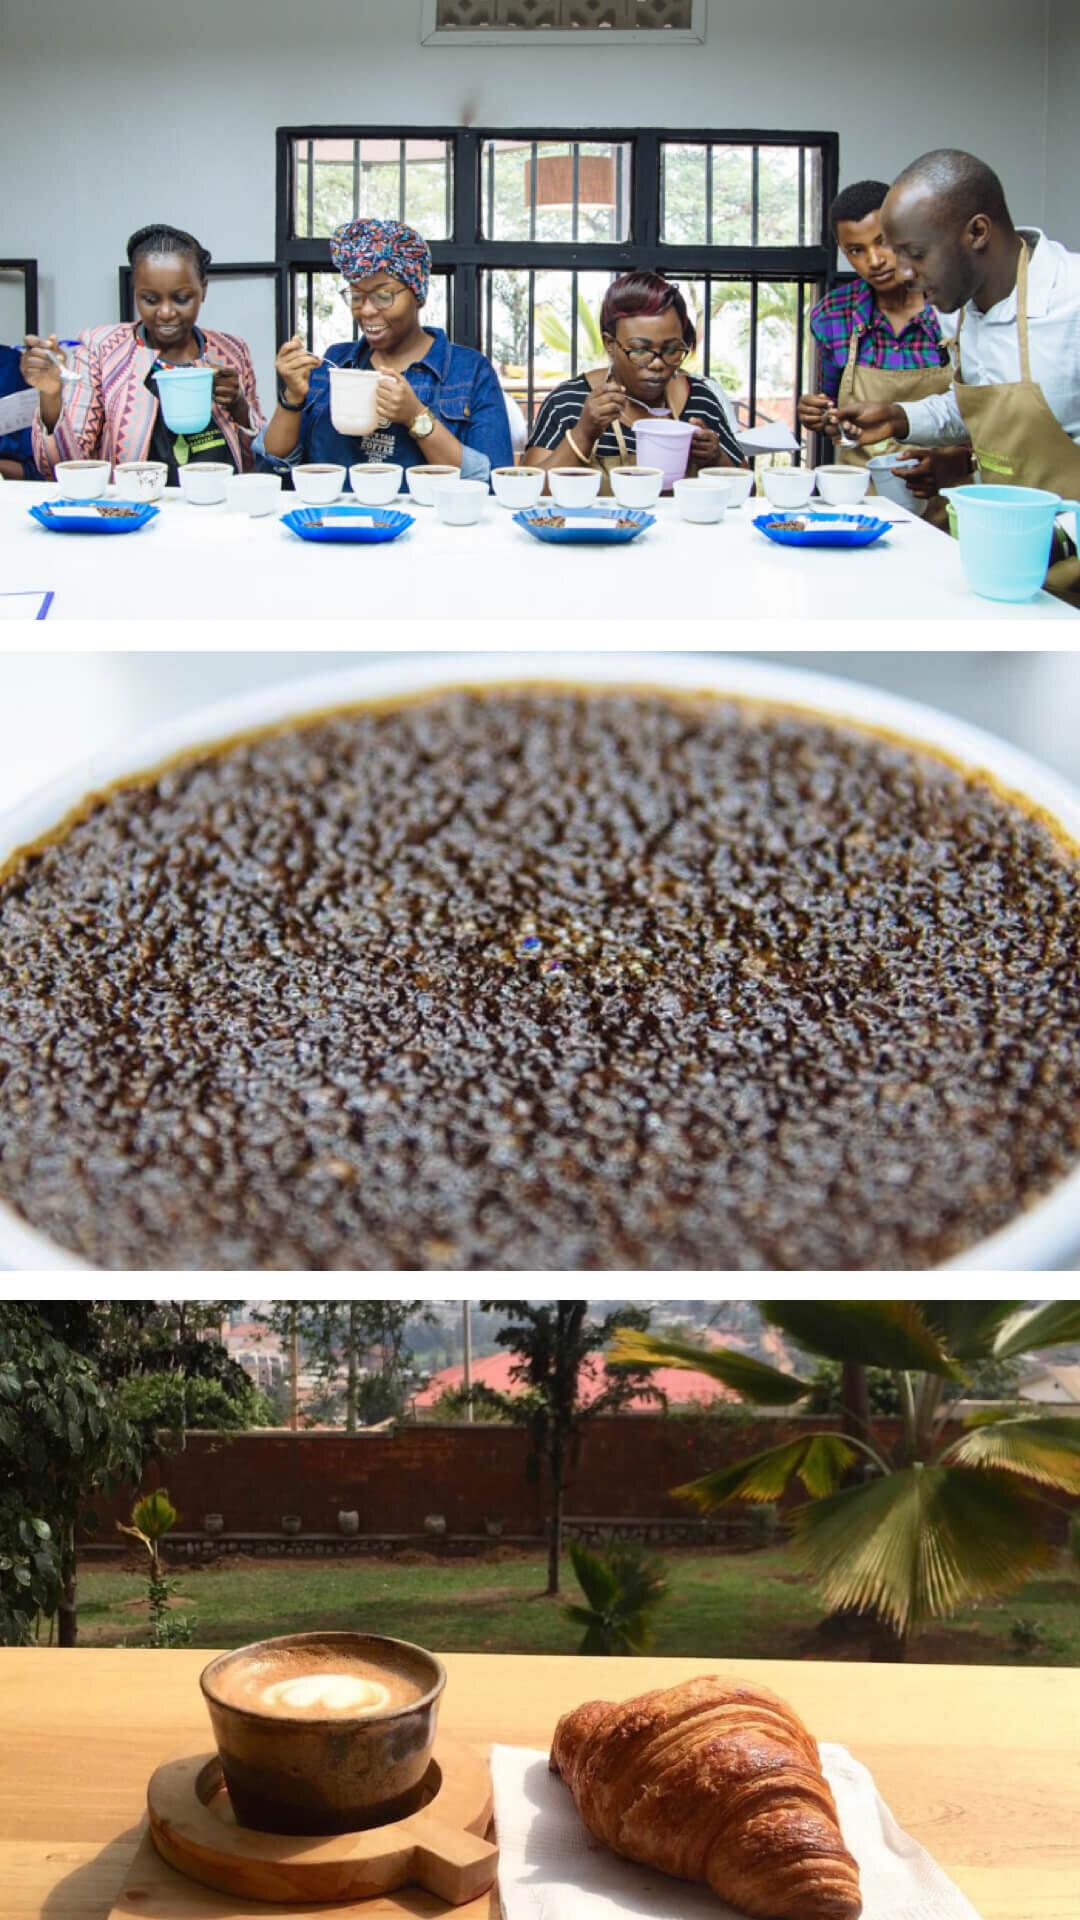 17.Take a specialty coffee masterclass